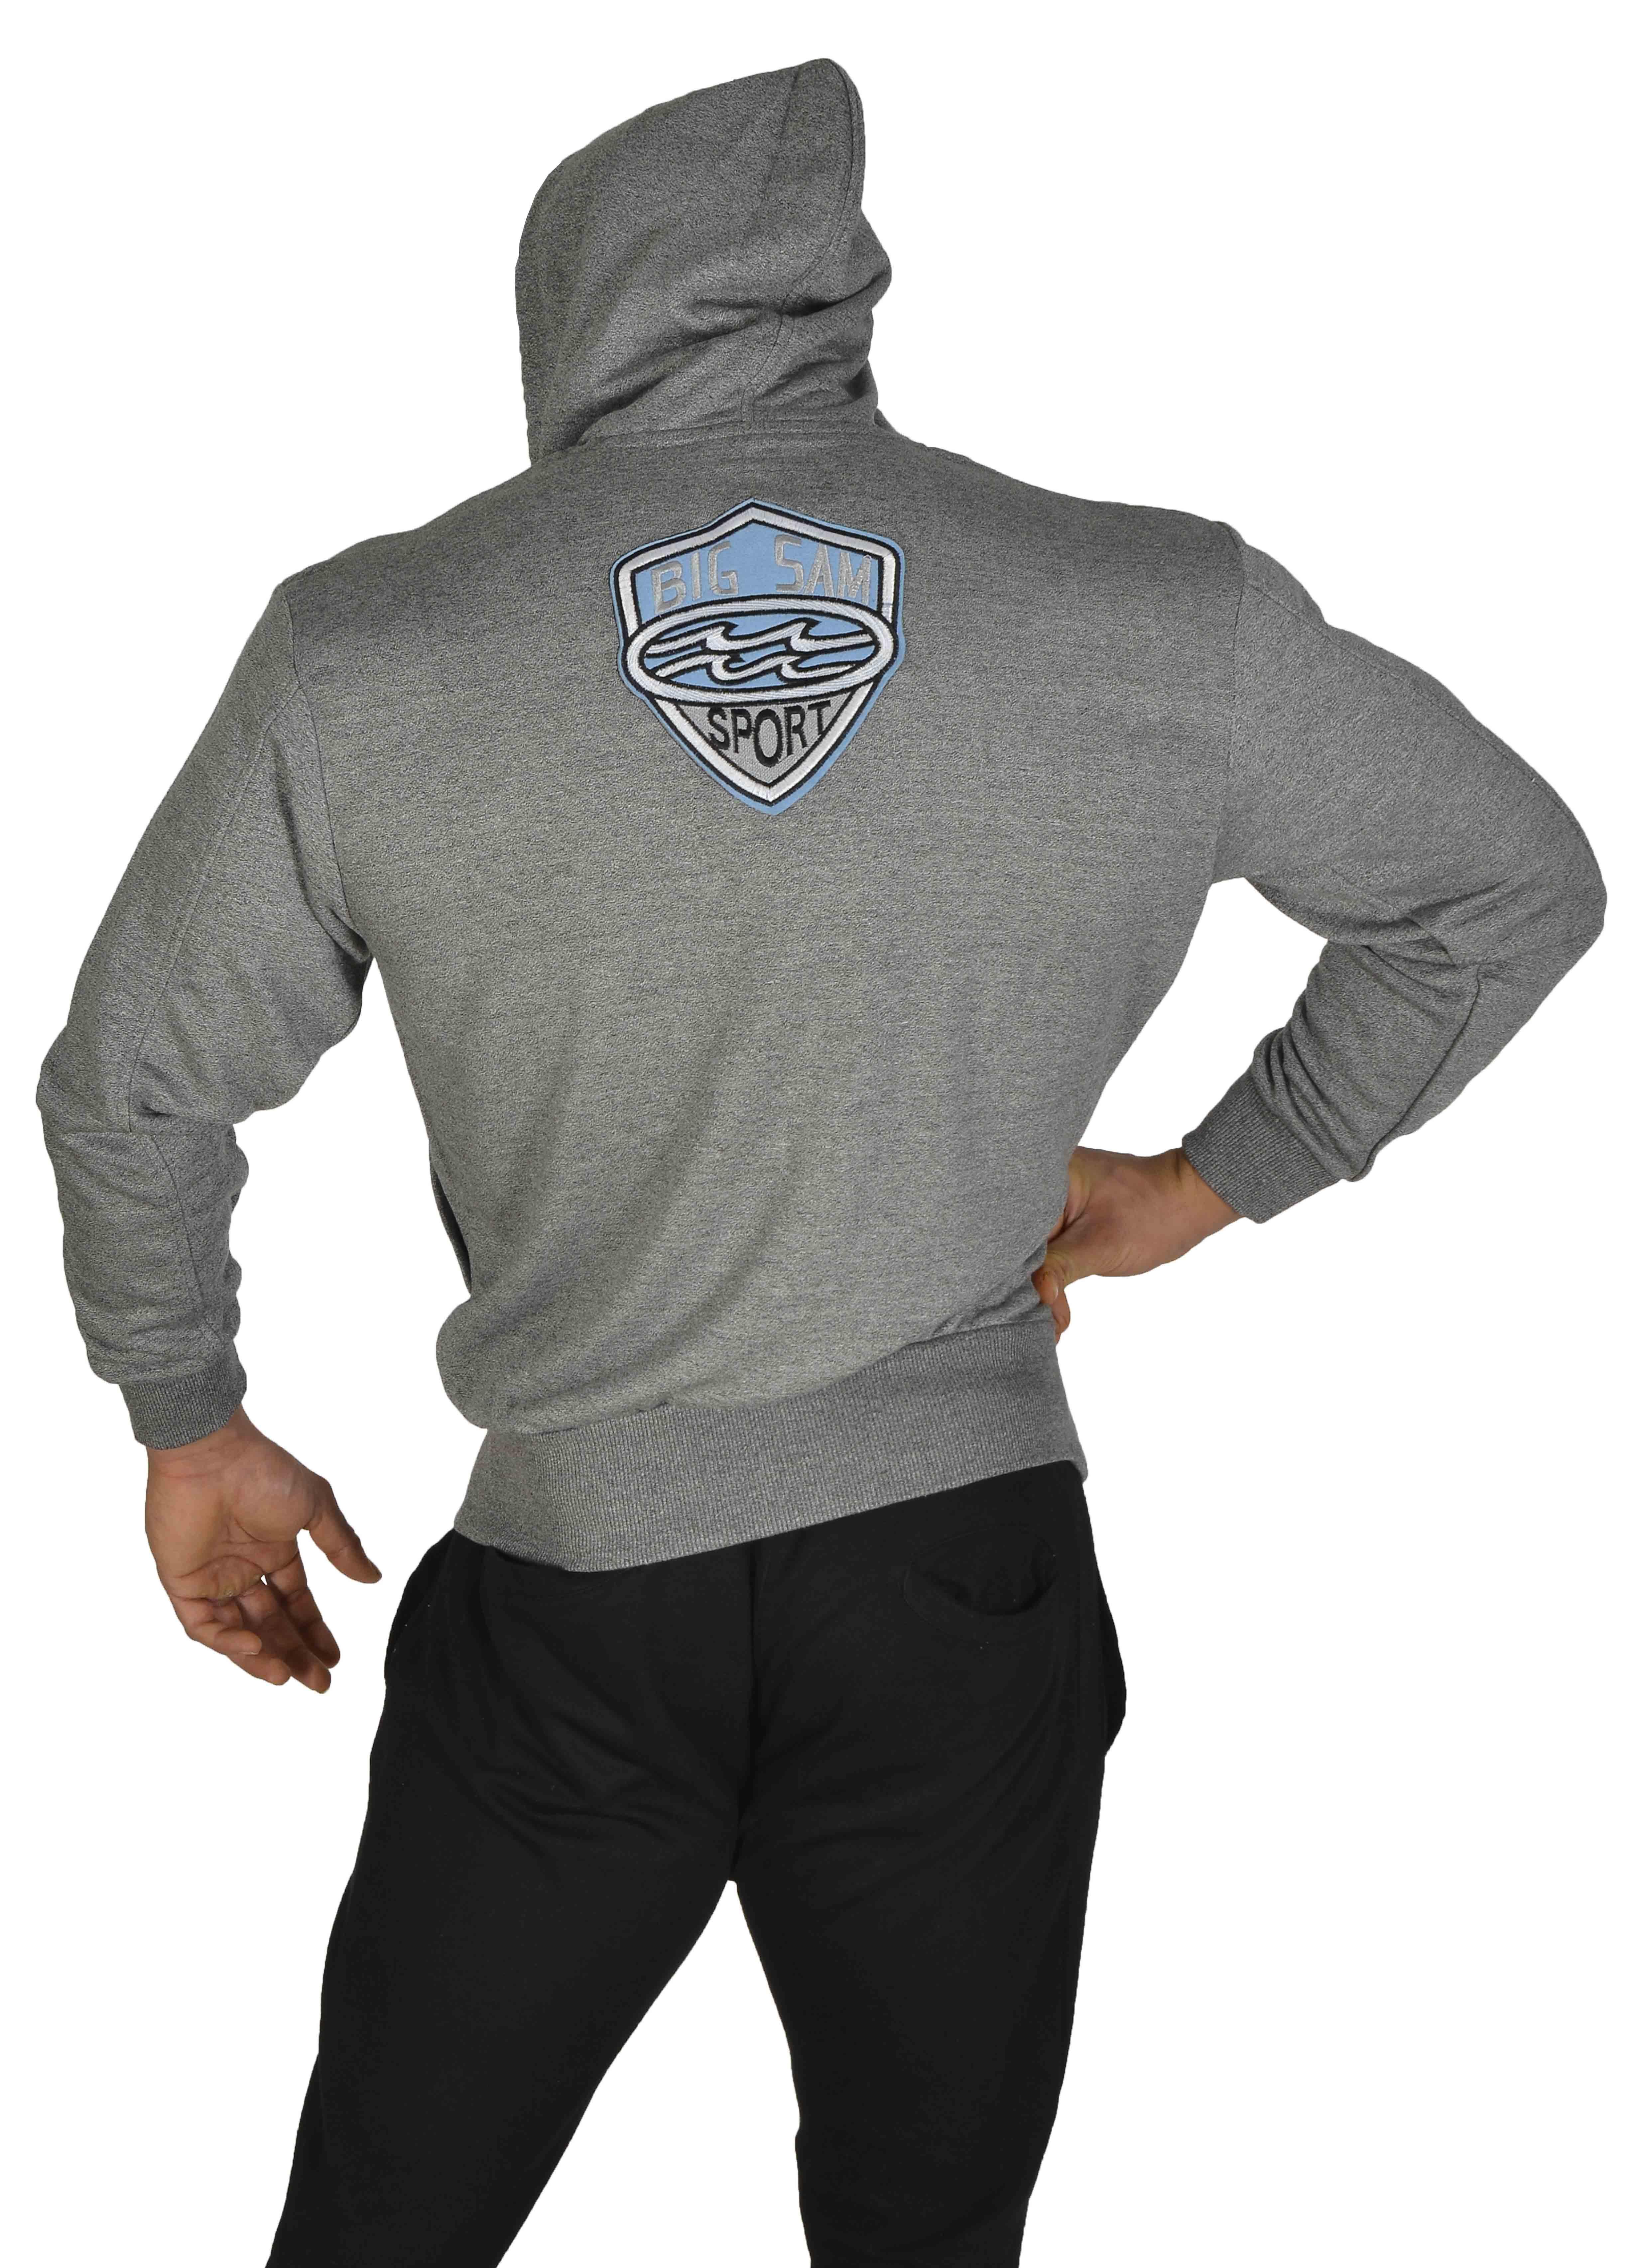 3579 con Sportswear Sm capucha chaqueta Big Extreme sudadera Bodybuilding P8O7xa